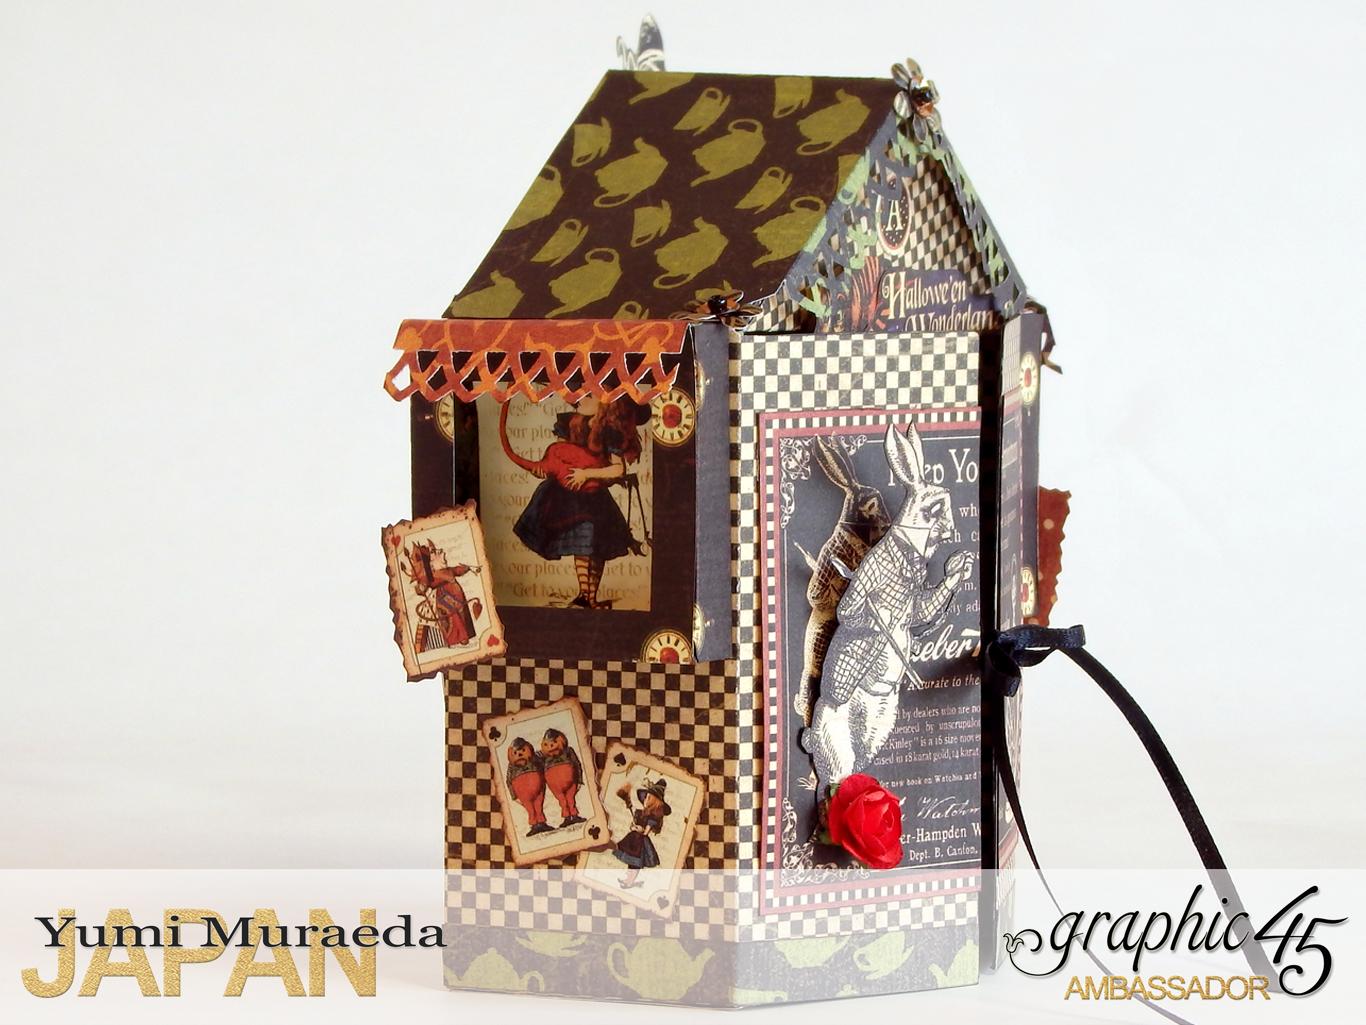 2 Alices Odd Tea HouseHalloween Wonderlandby Yumi MuraedaProduct by Graphic 45